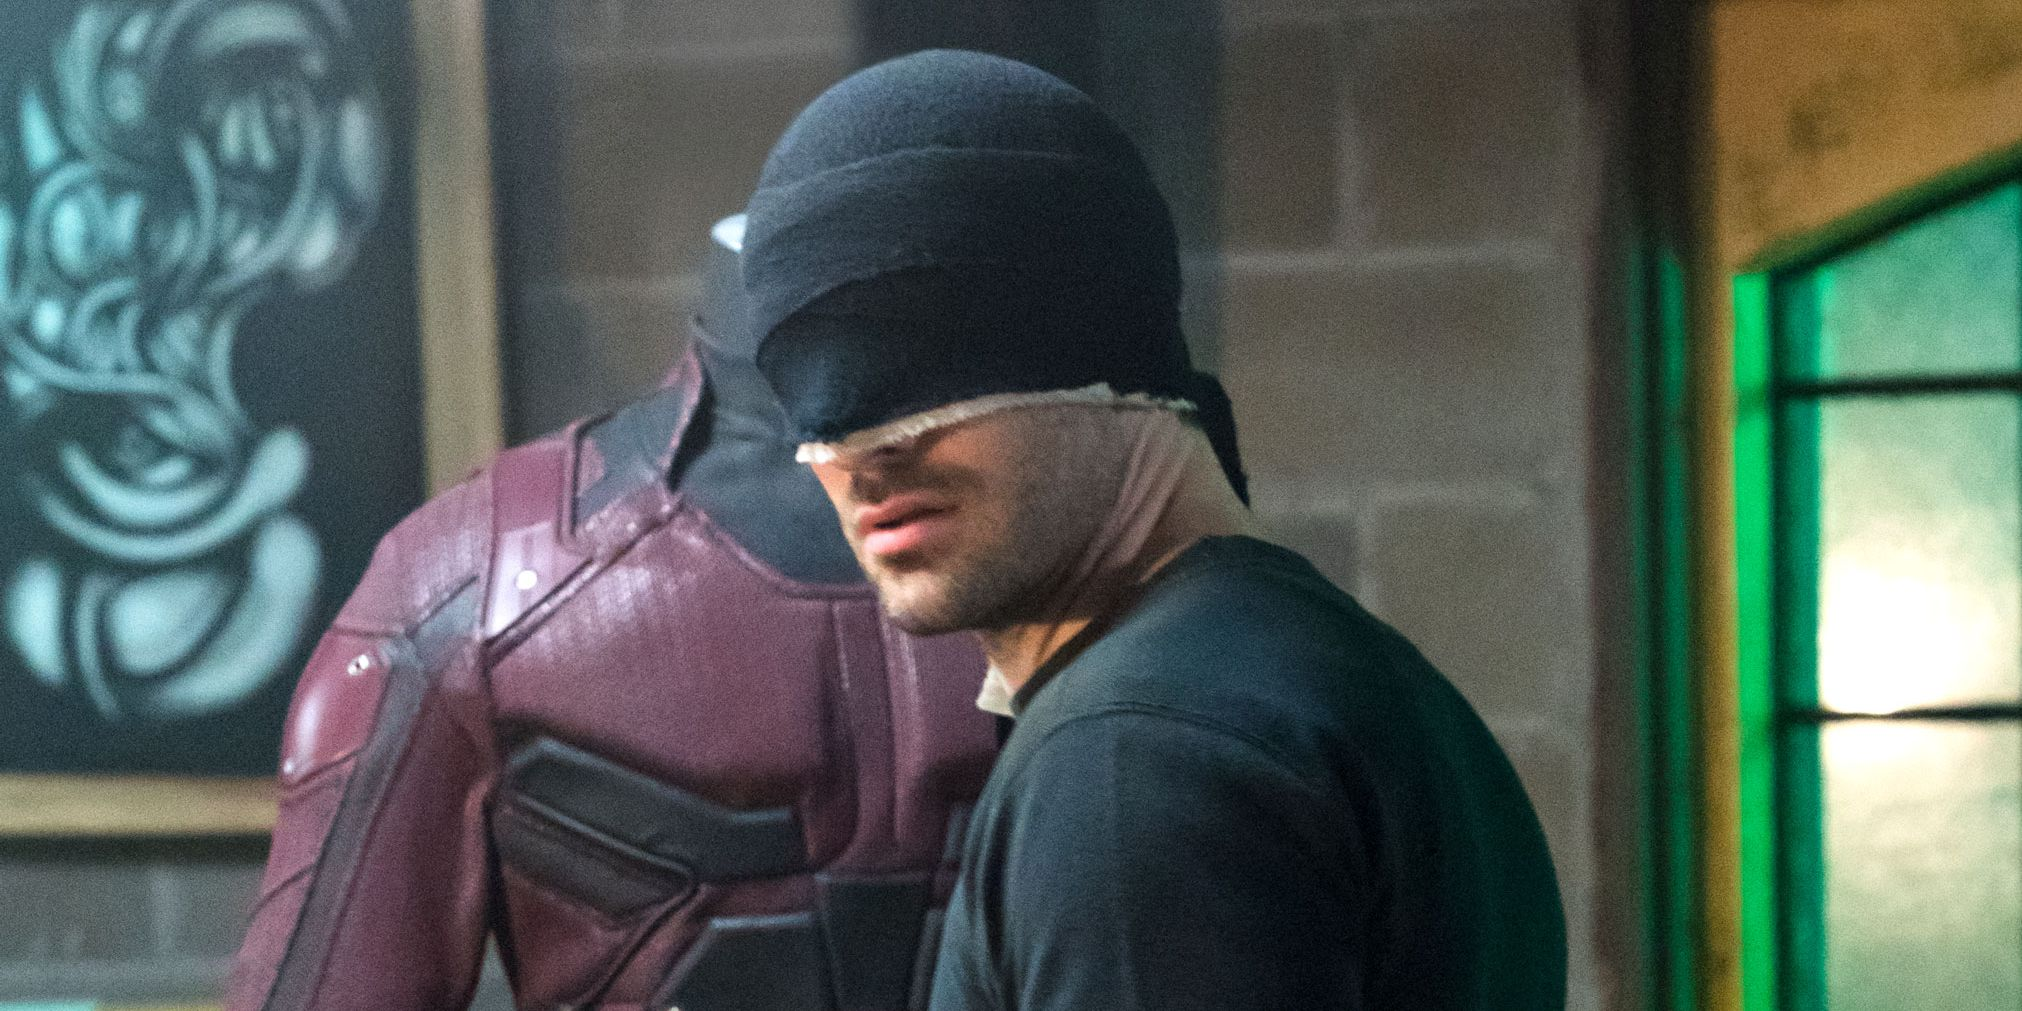 Charlie Cox as Daredevil, season 2